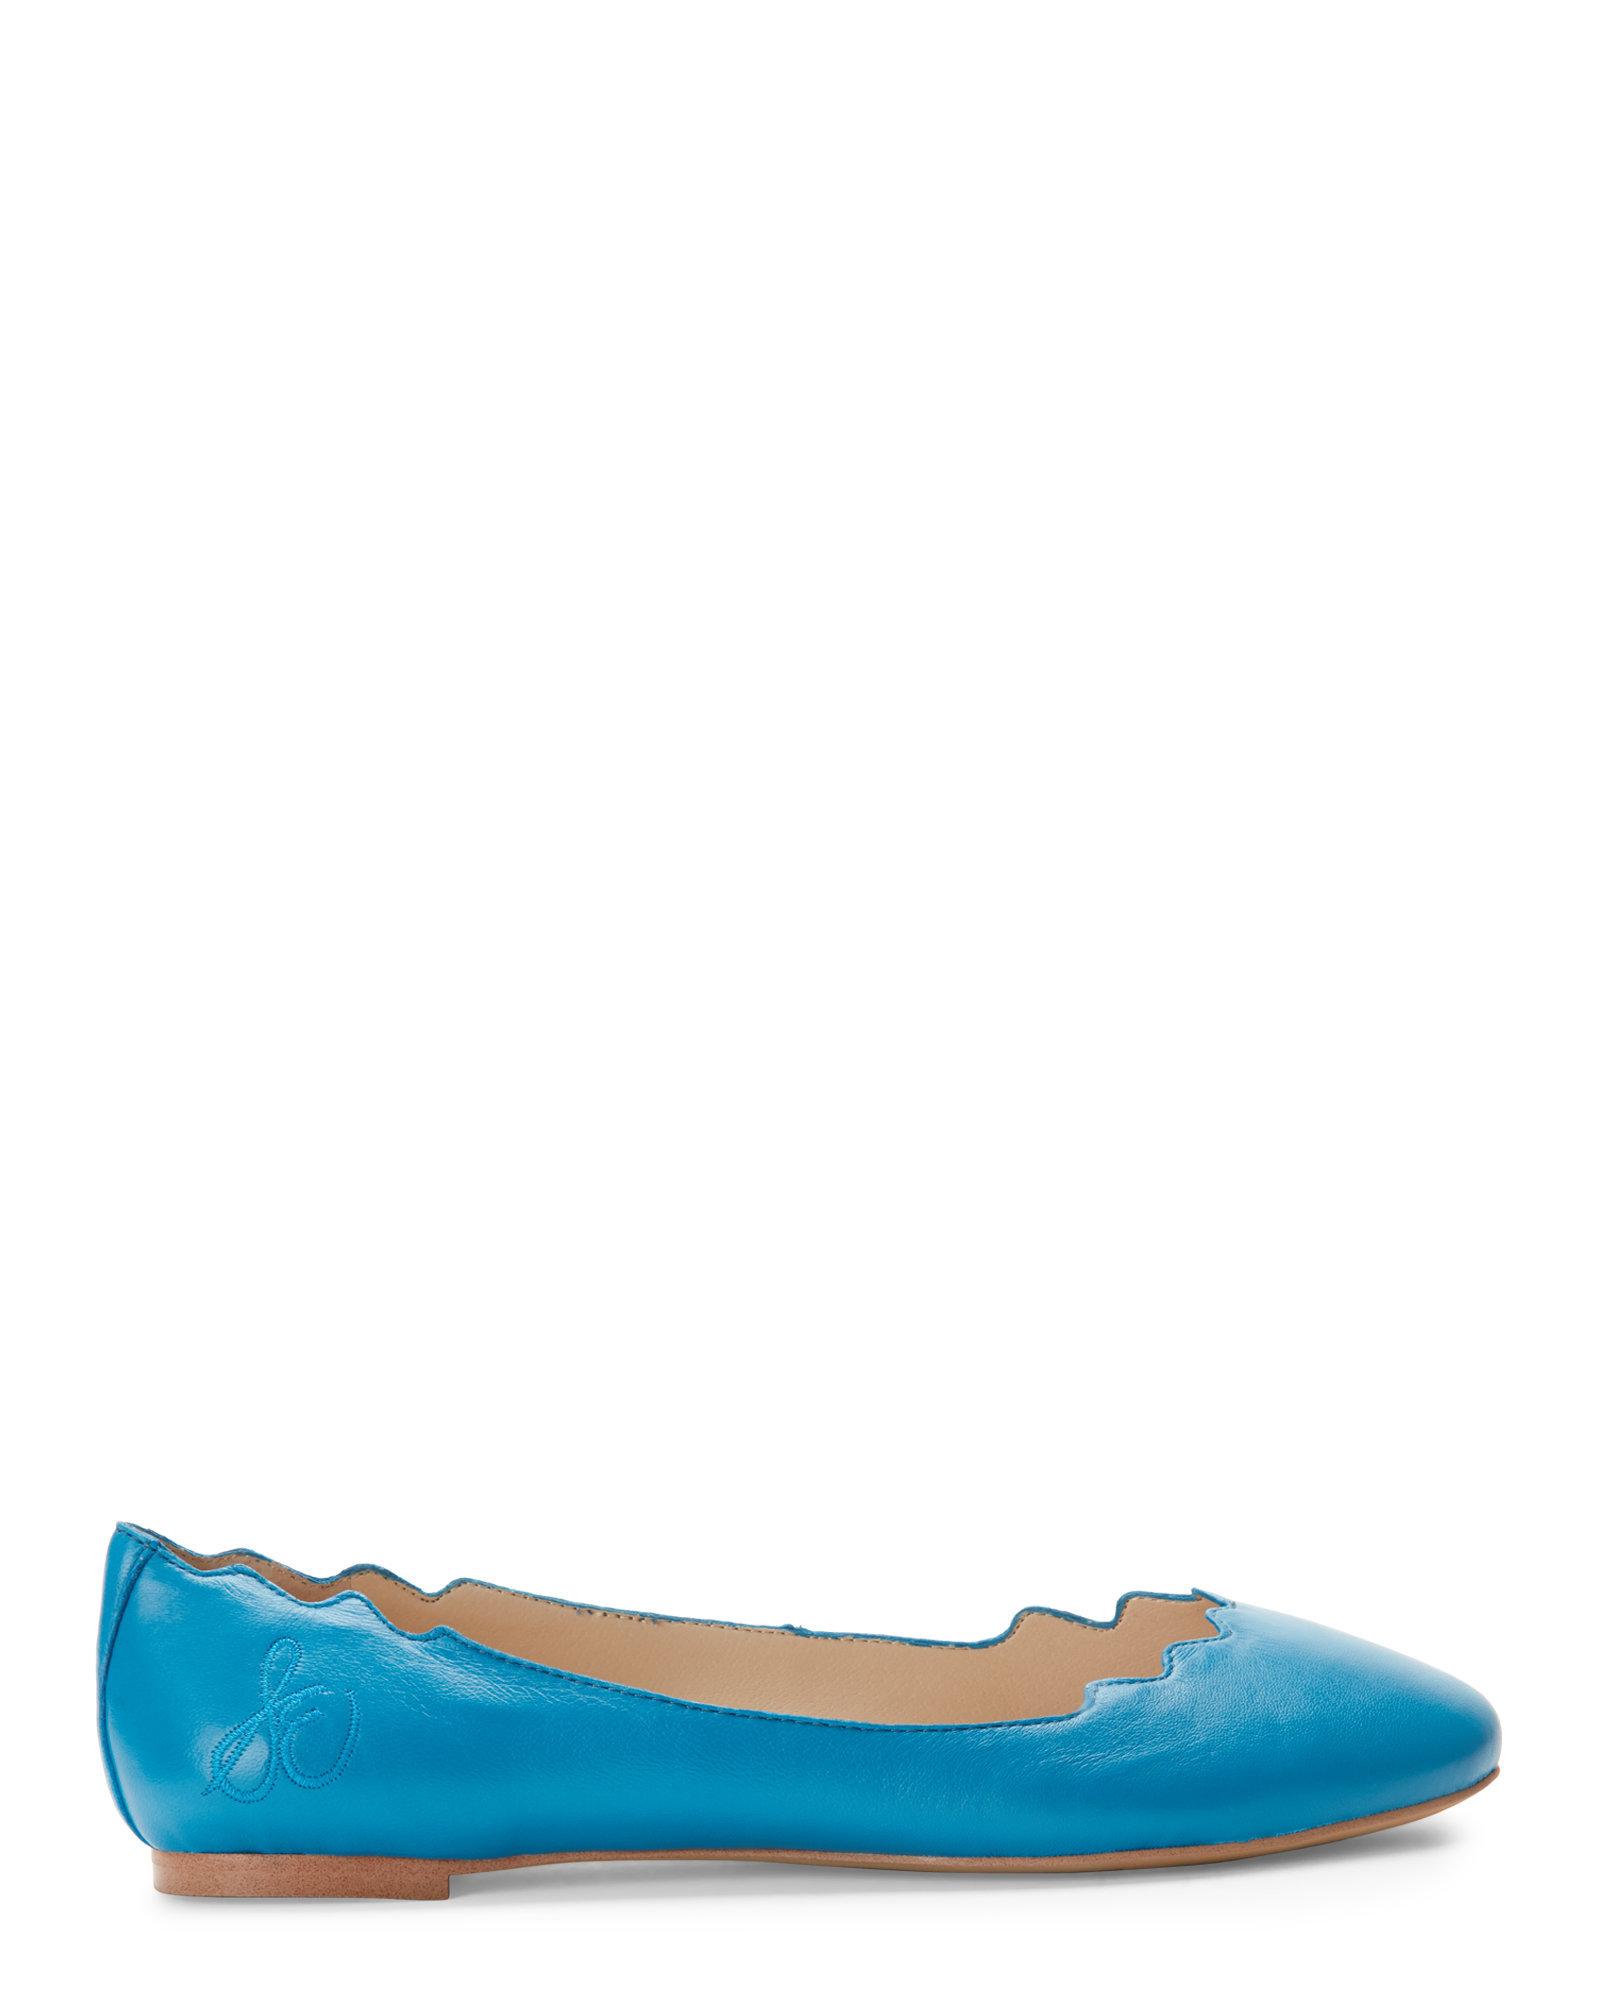 51ec273d01b724 Lyst - Sam Edelman Malibu Blue Augusta Ballet Flats in Blue